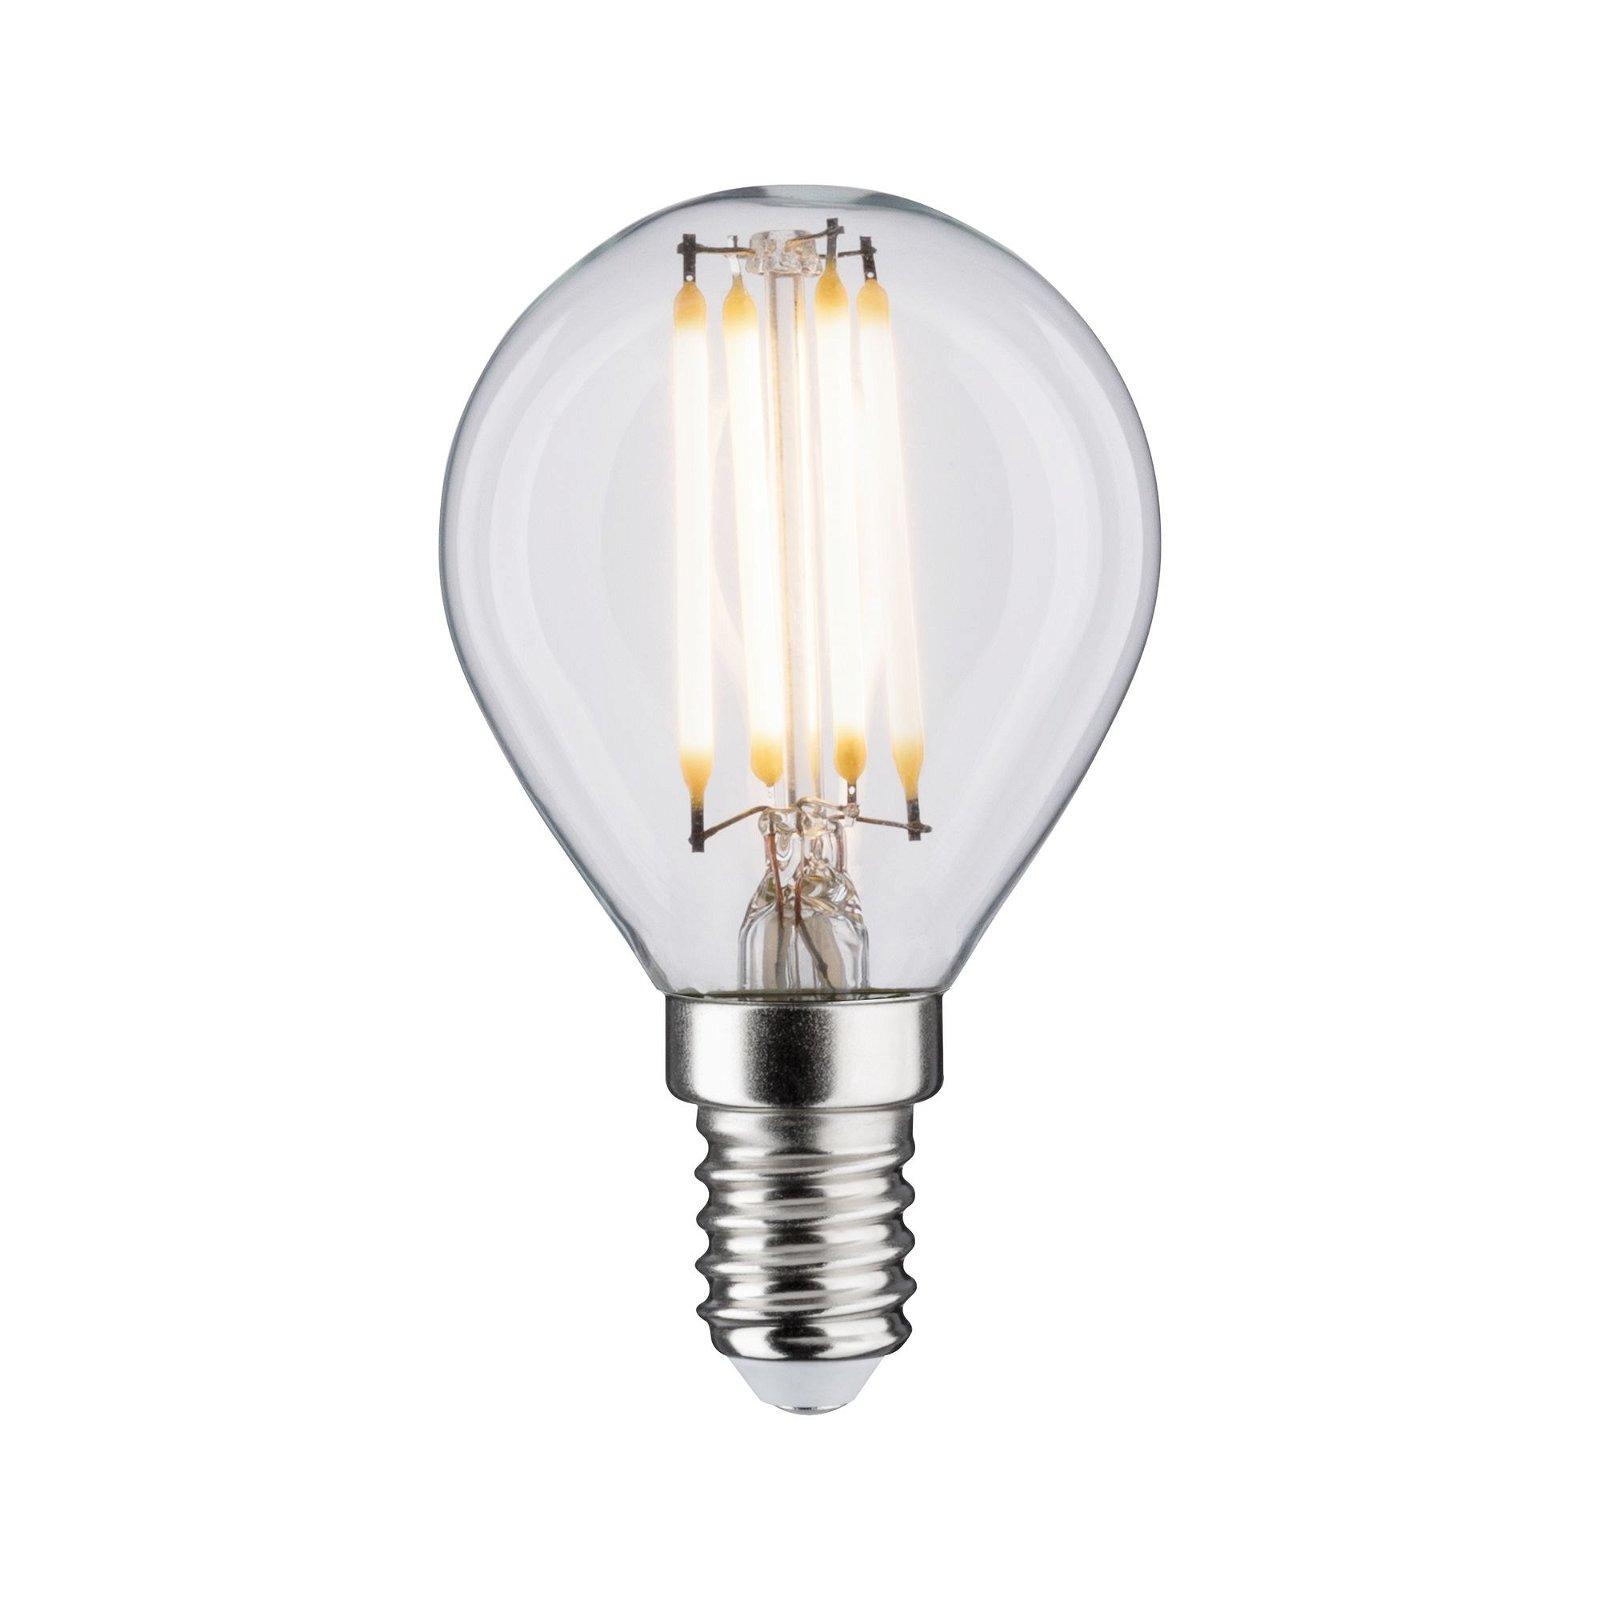 LED Tropfen Filament E14 230V 432lm 5W 2700K Klar